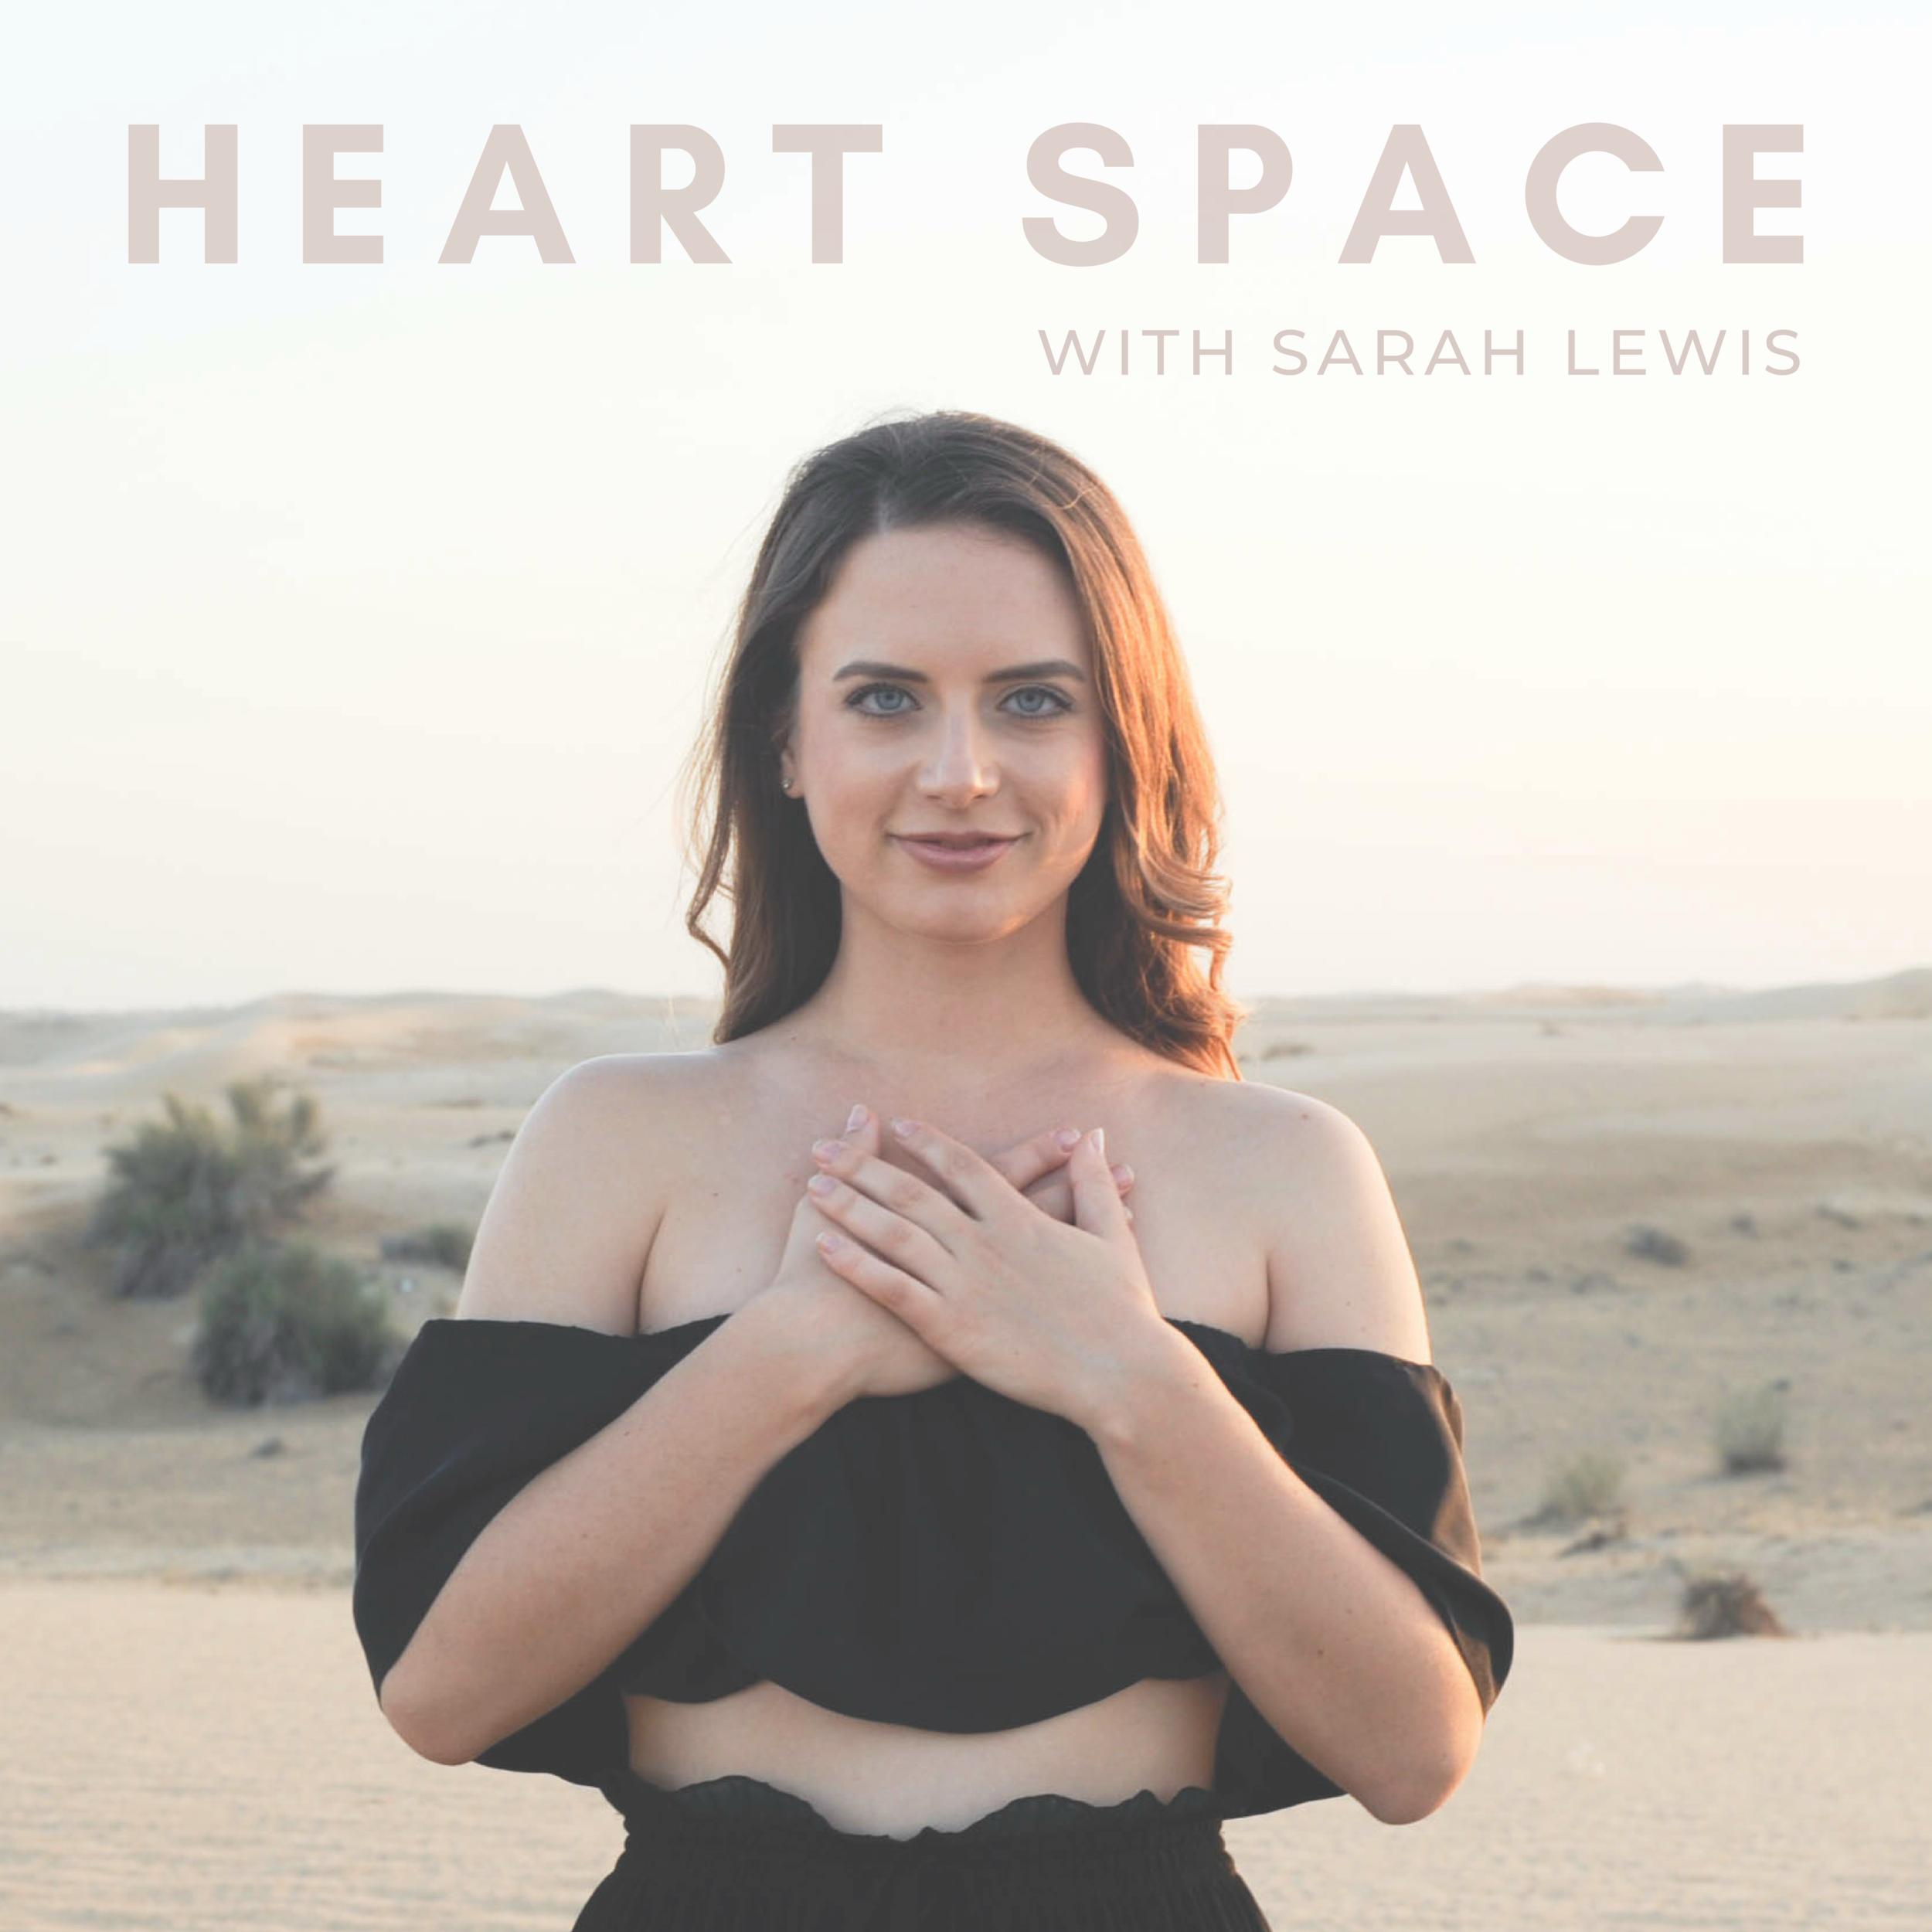 sarah-lewis-heart-space-desert-image.png